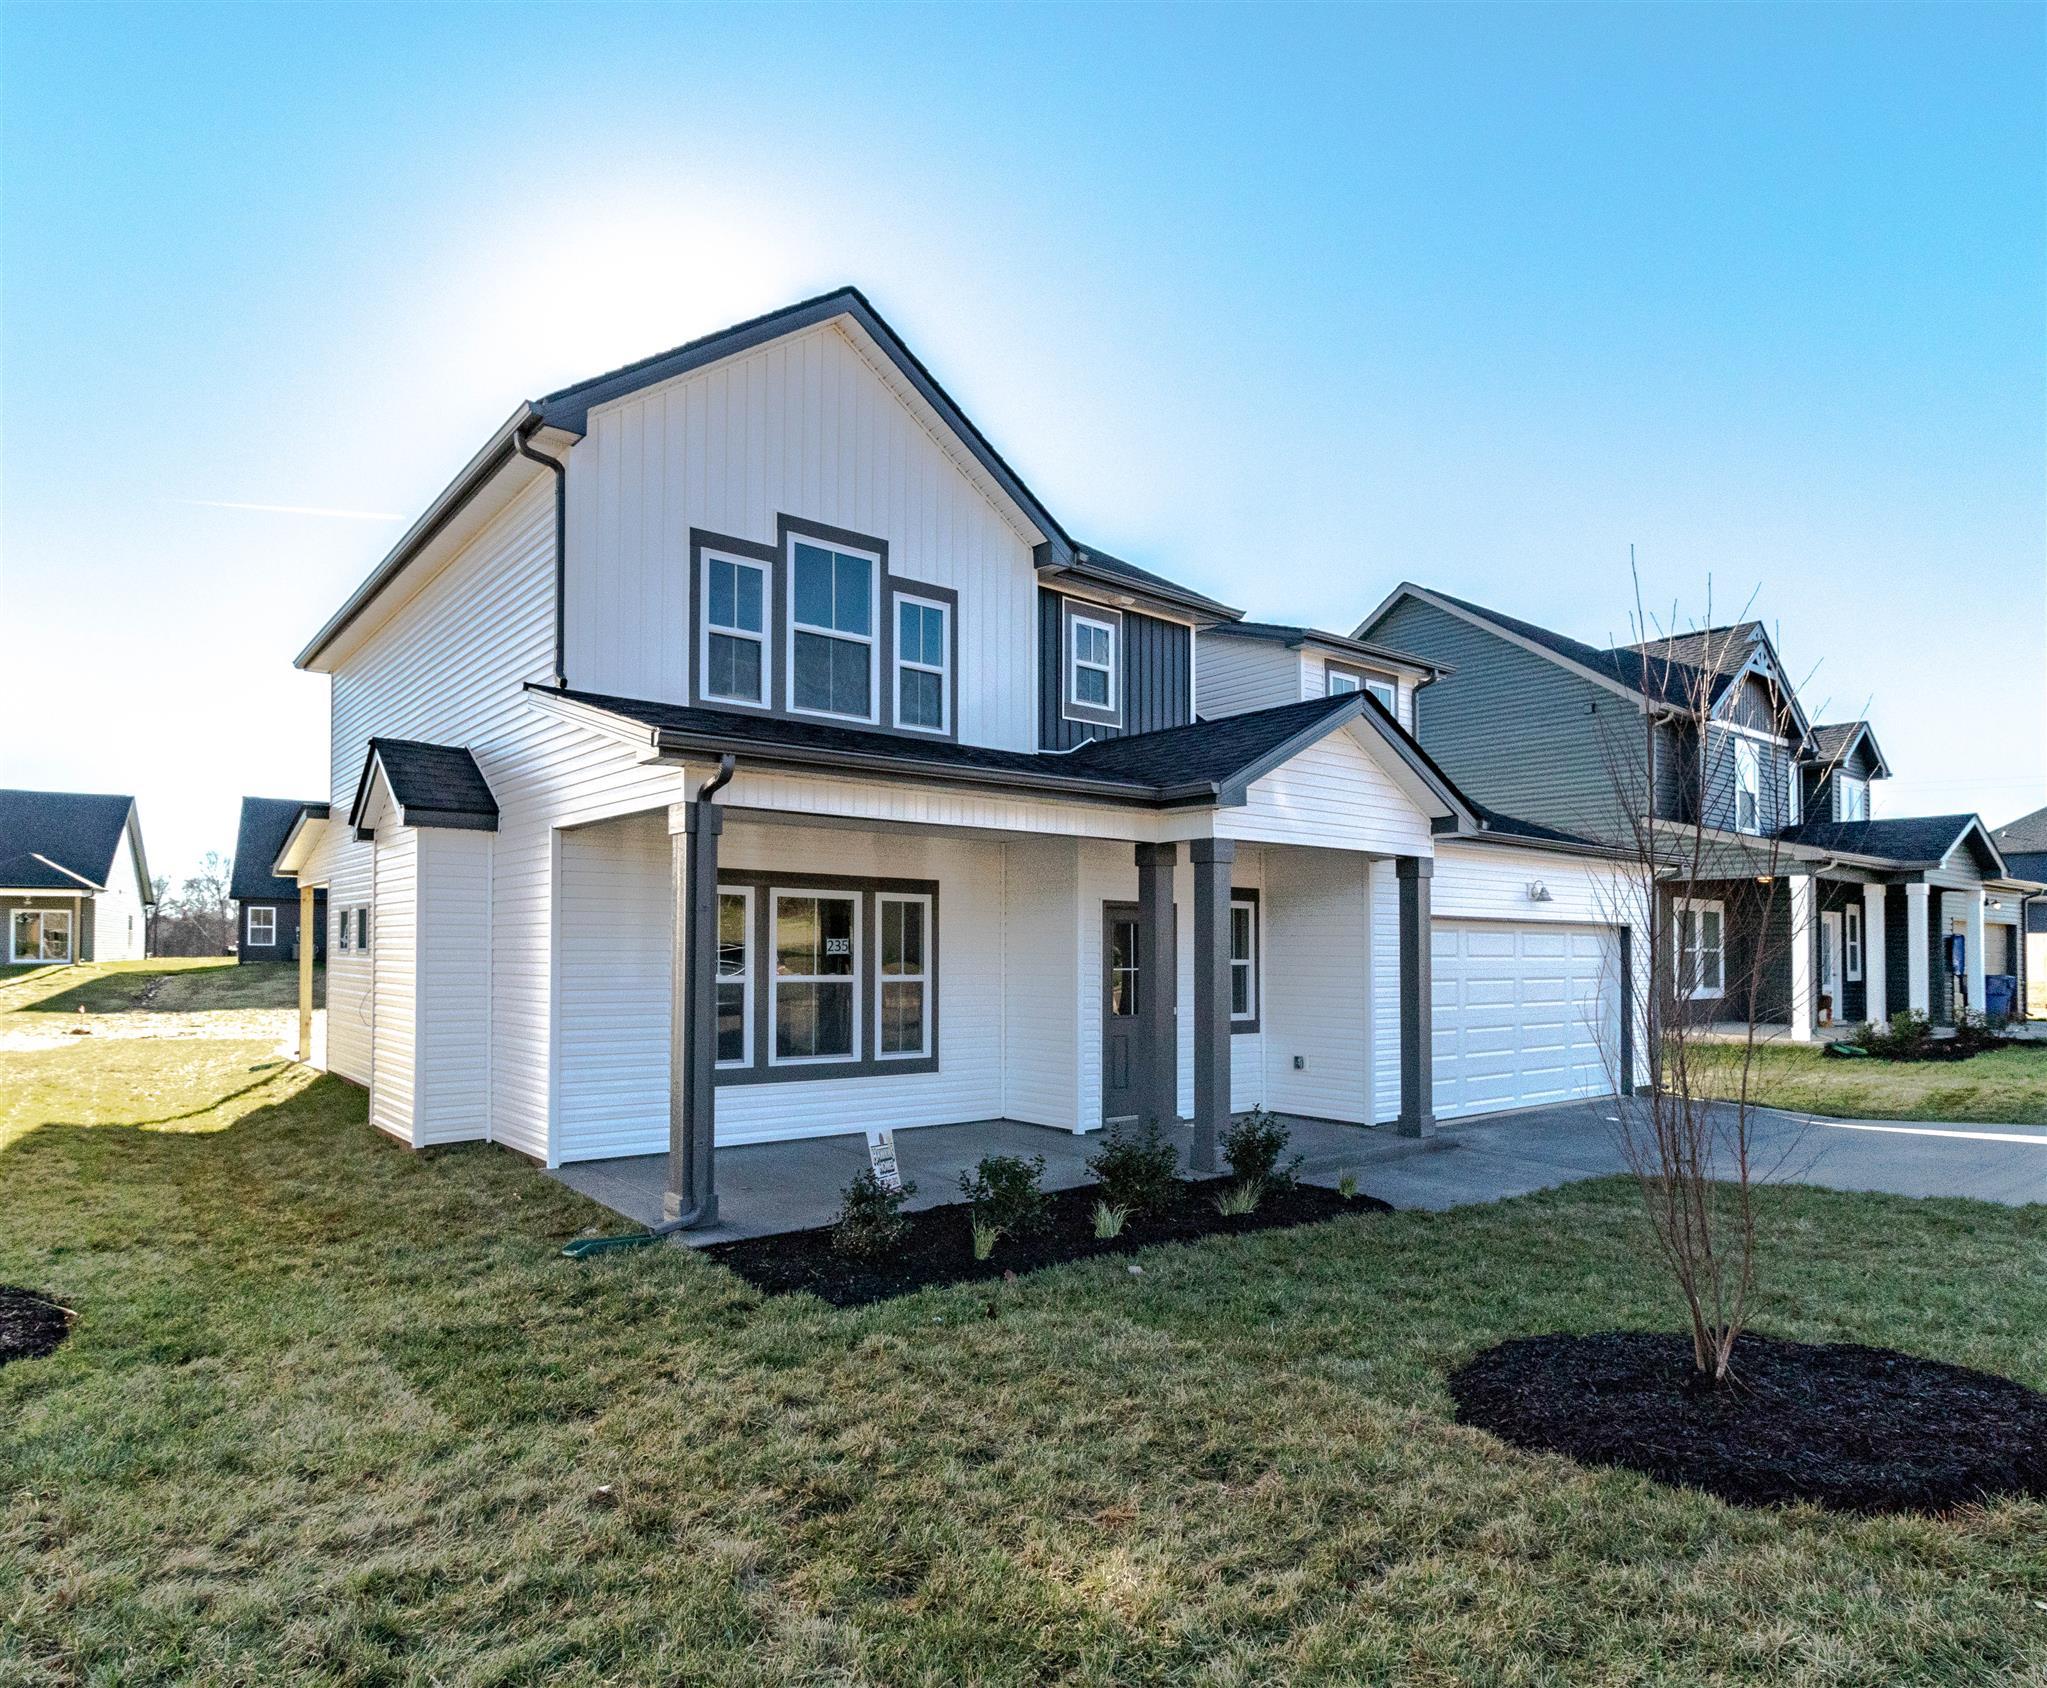 326 Eagles Bluff, Clarksville, TN 37040 - Clarksville, TN real estate listing